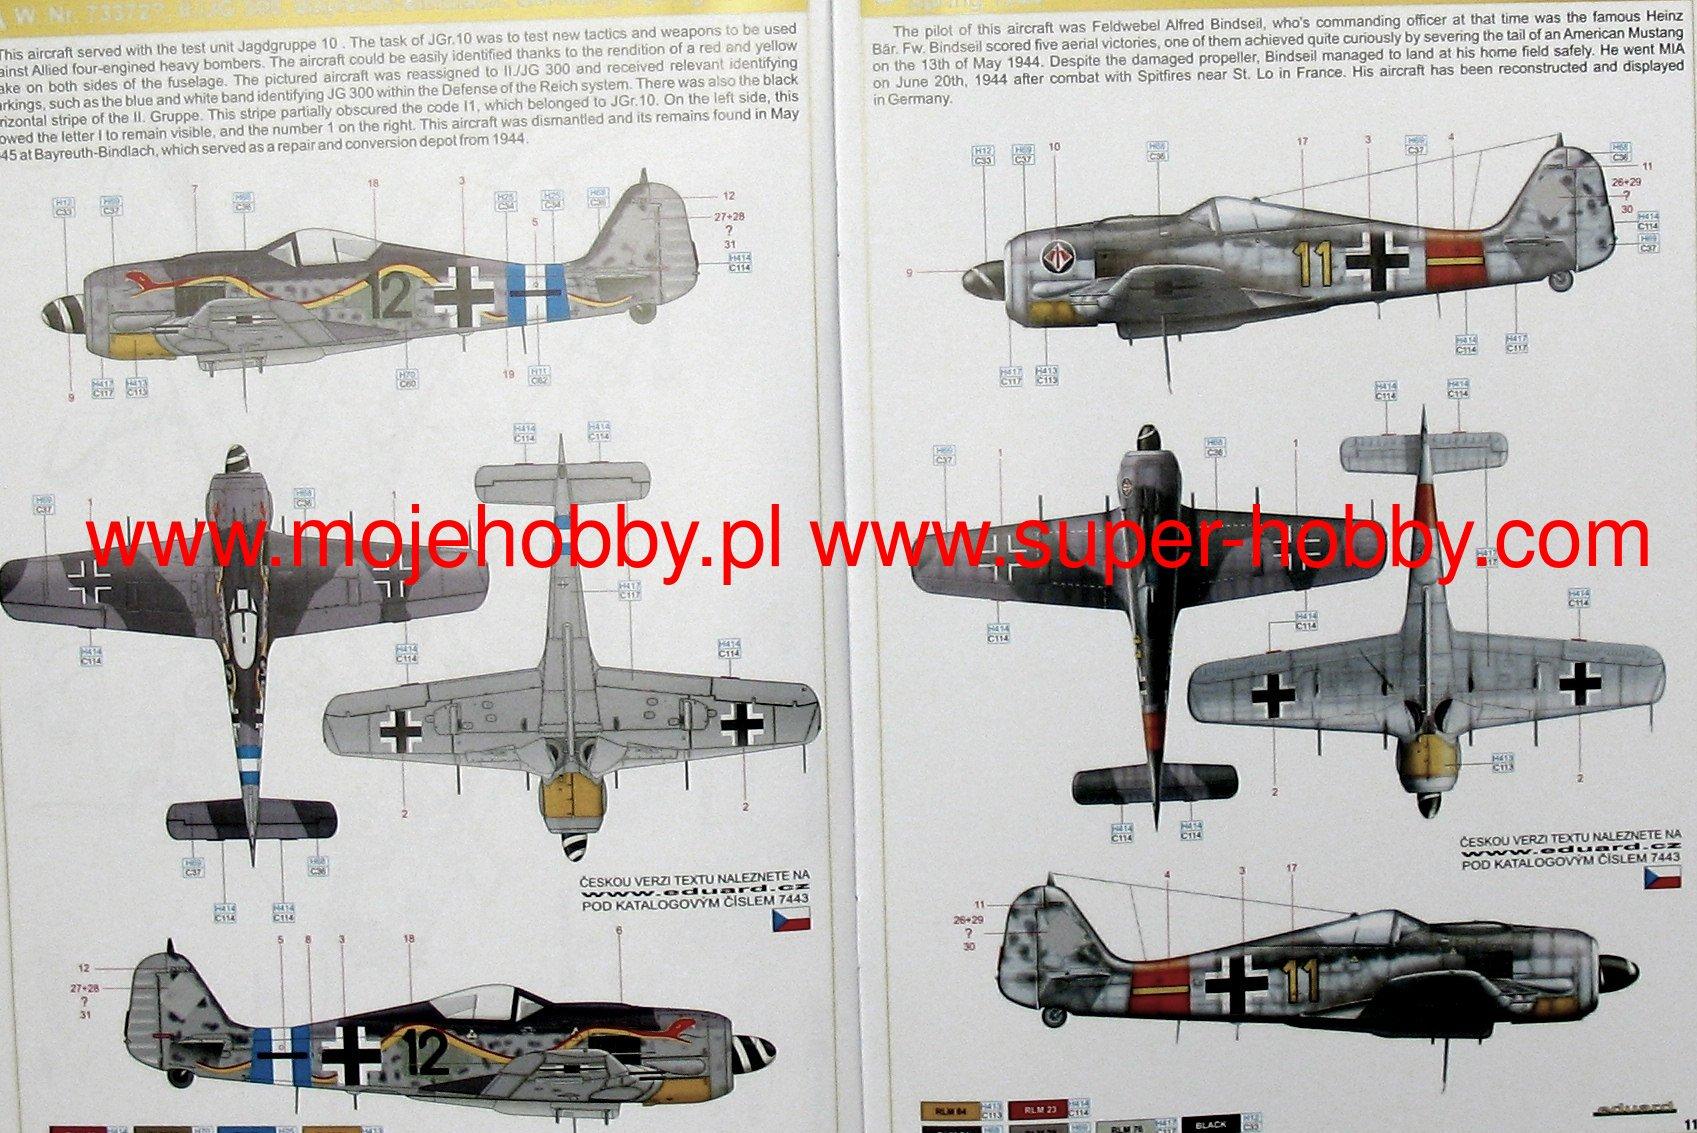 Eduard Weekend Edition échelle 1:72 FW 190A-8 Universal Wings Model Kit 7443